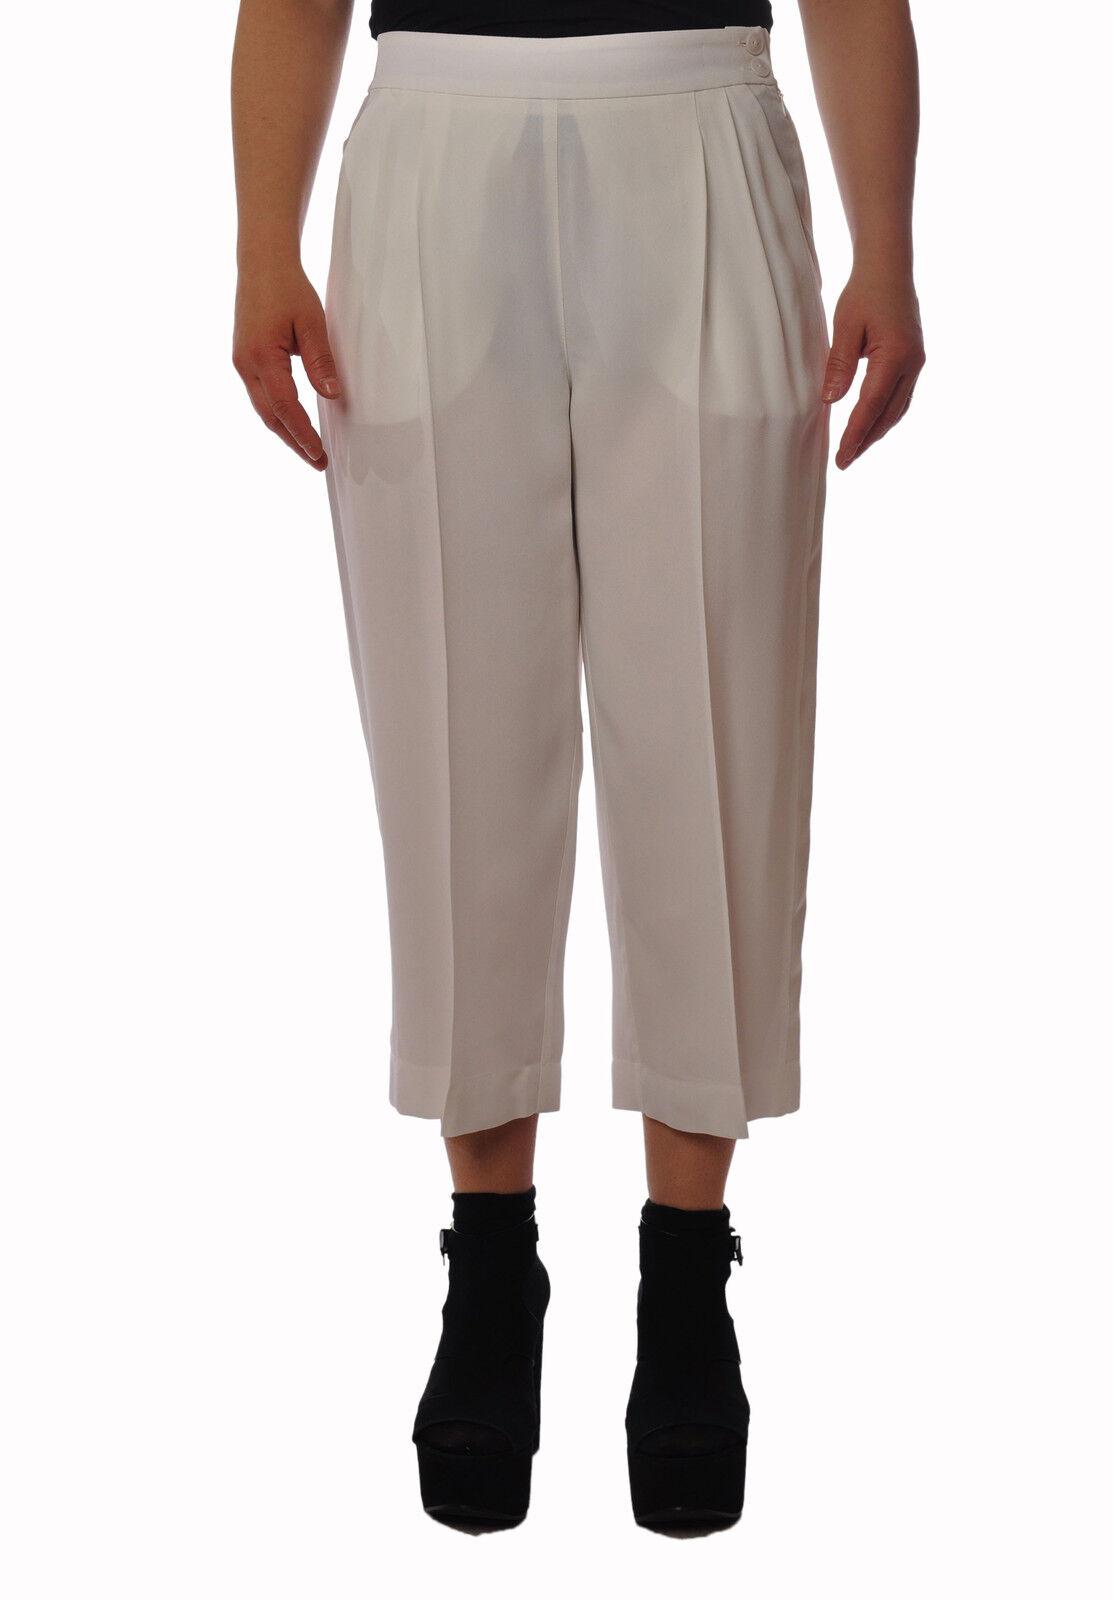 Patrizia Pepe  -  Pants - Female - White - 3649525A184438